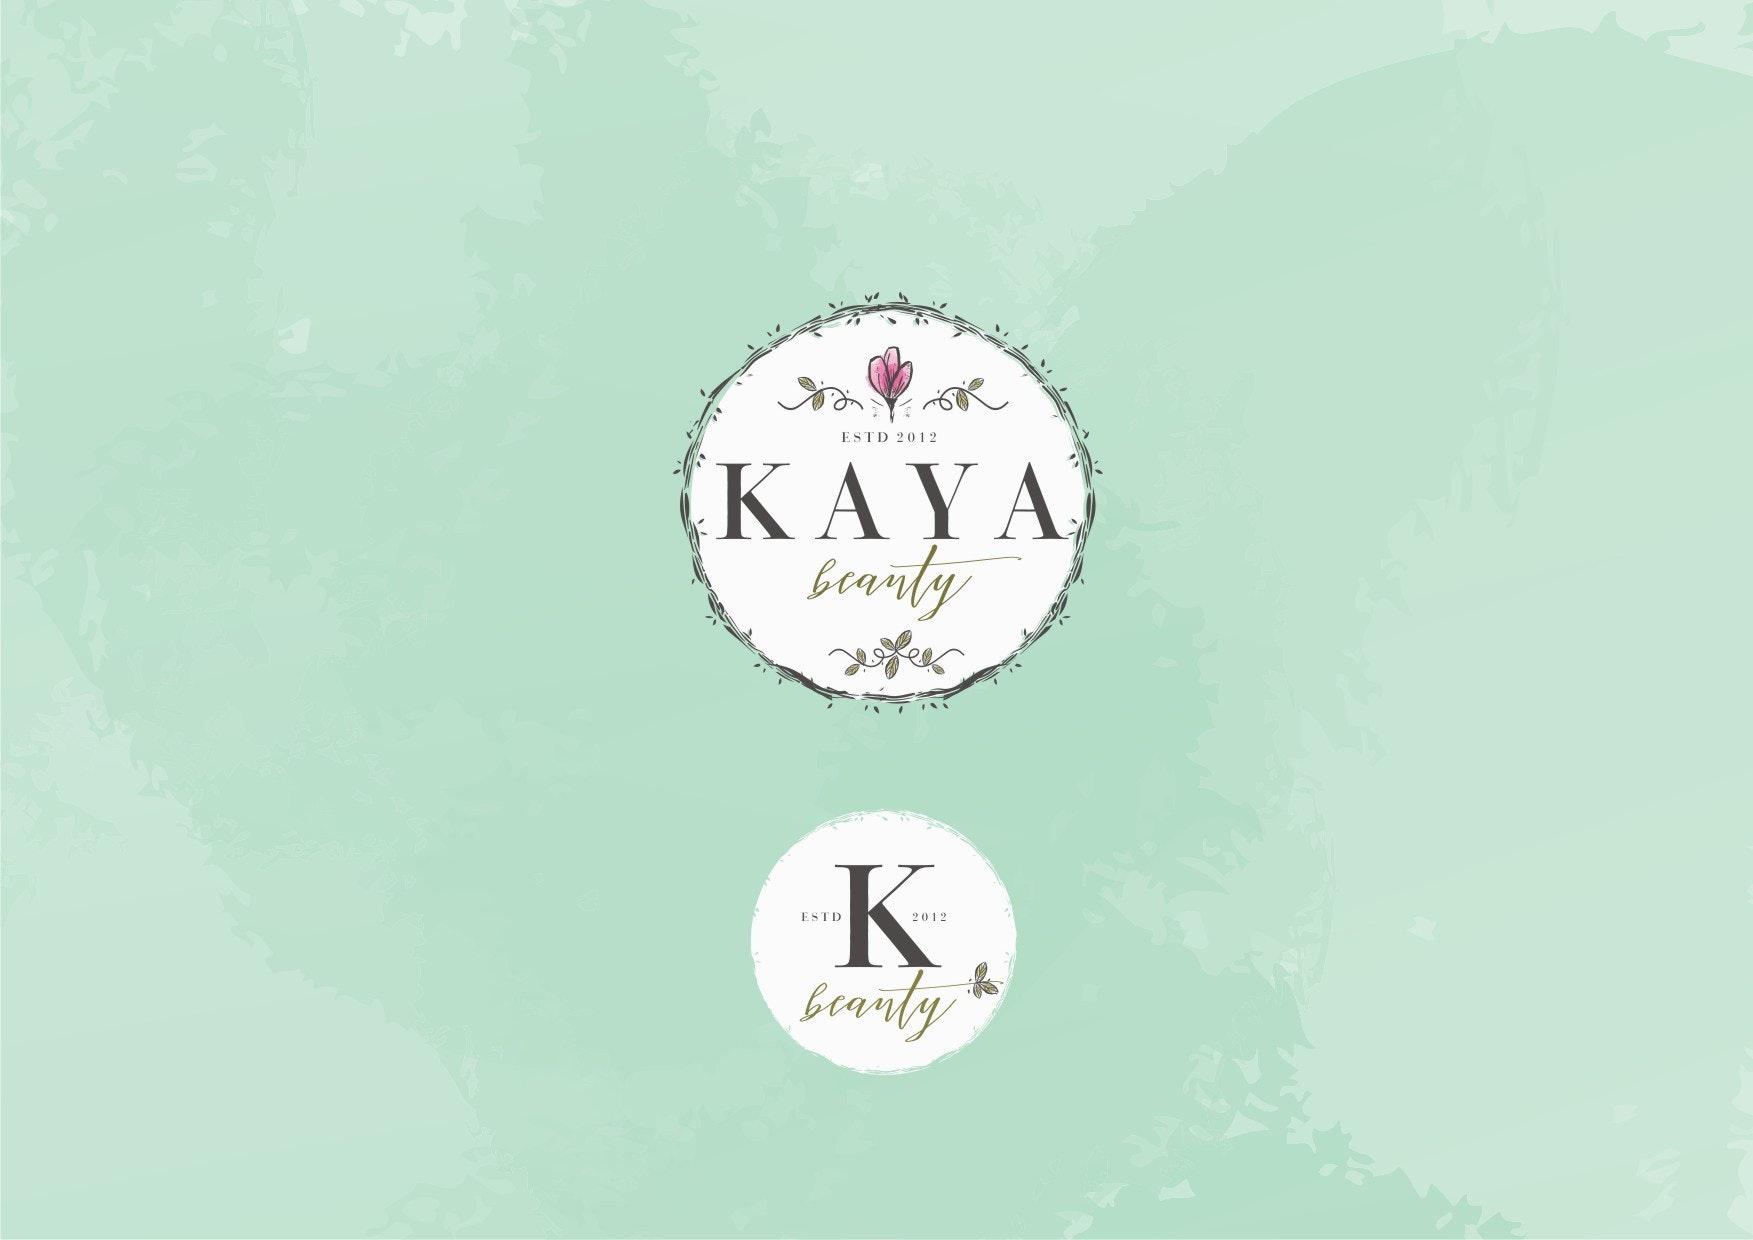 Kaya Beauty logo